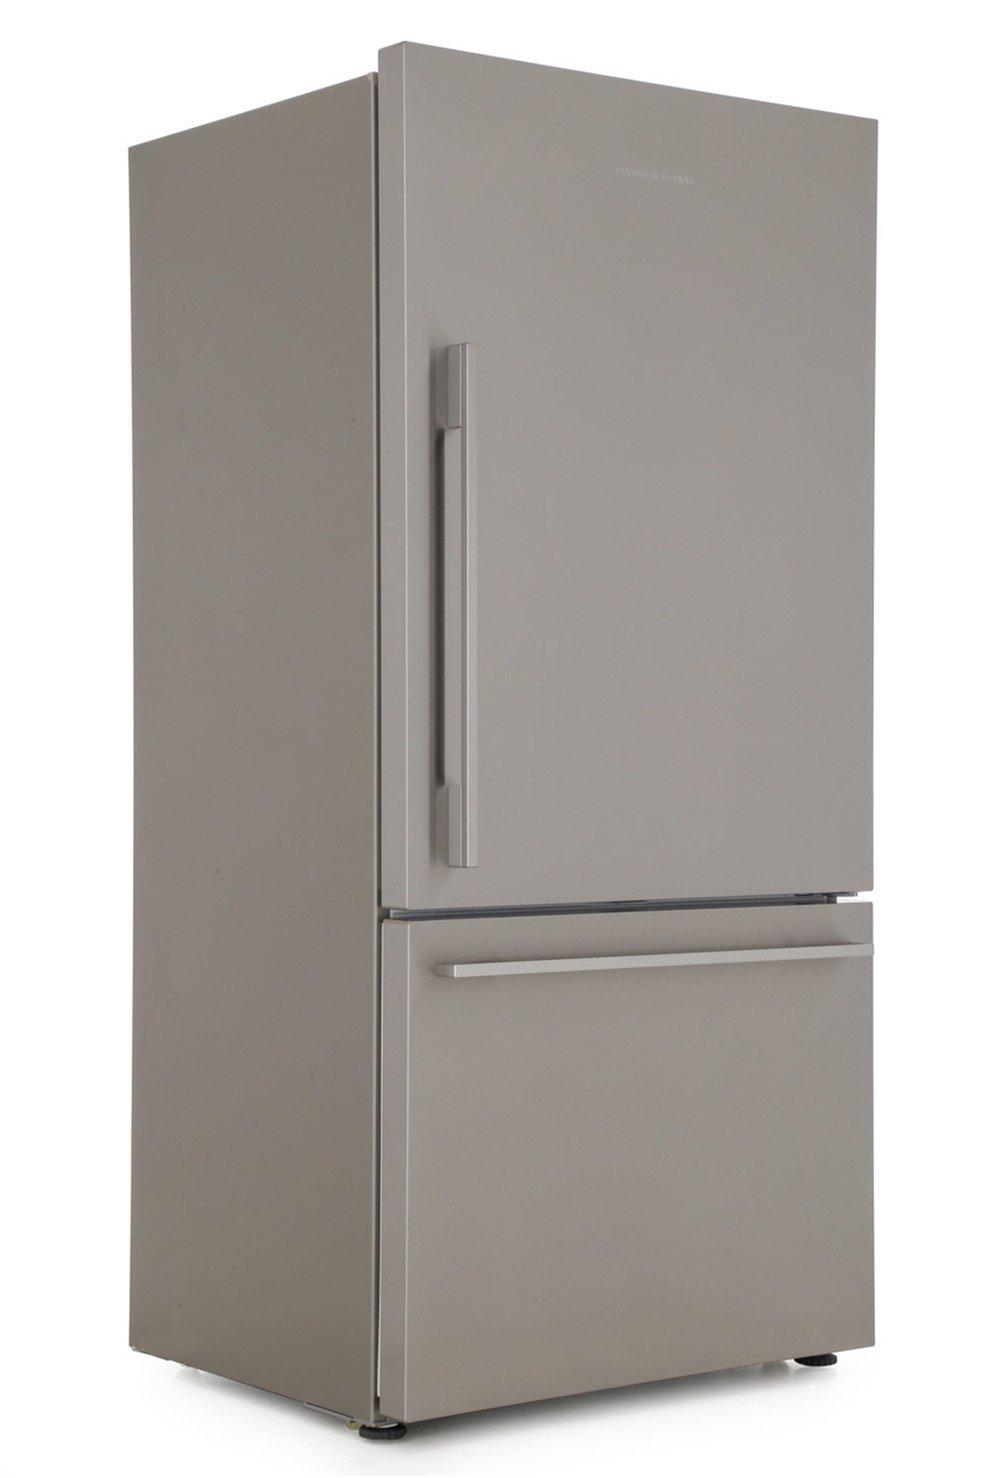 Fisher & Paykel Series 7 RF522WDRX4 Frost Free Fridge Freezer